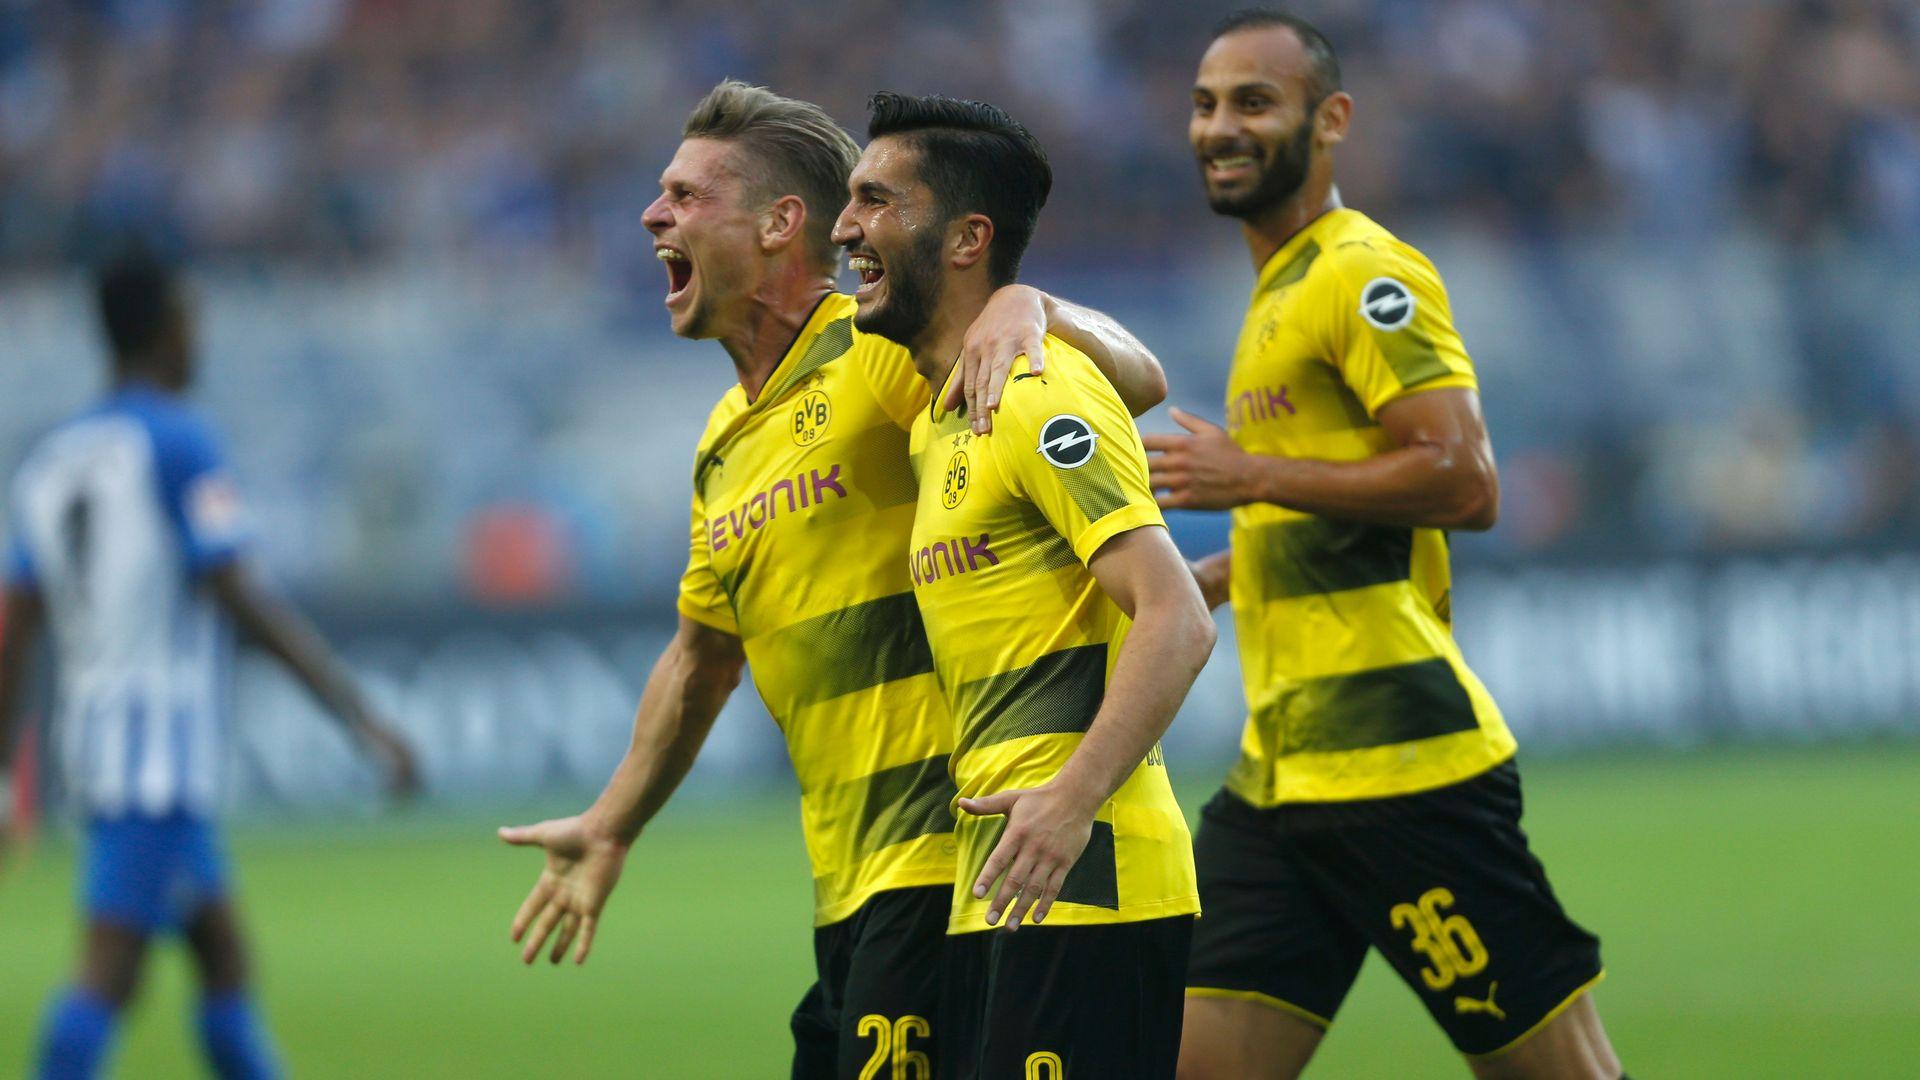 Nuri Sahin Borussia Dortmund Hertha Berlin Bundesliga 08262017